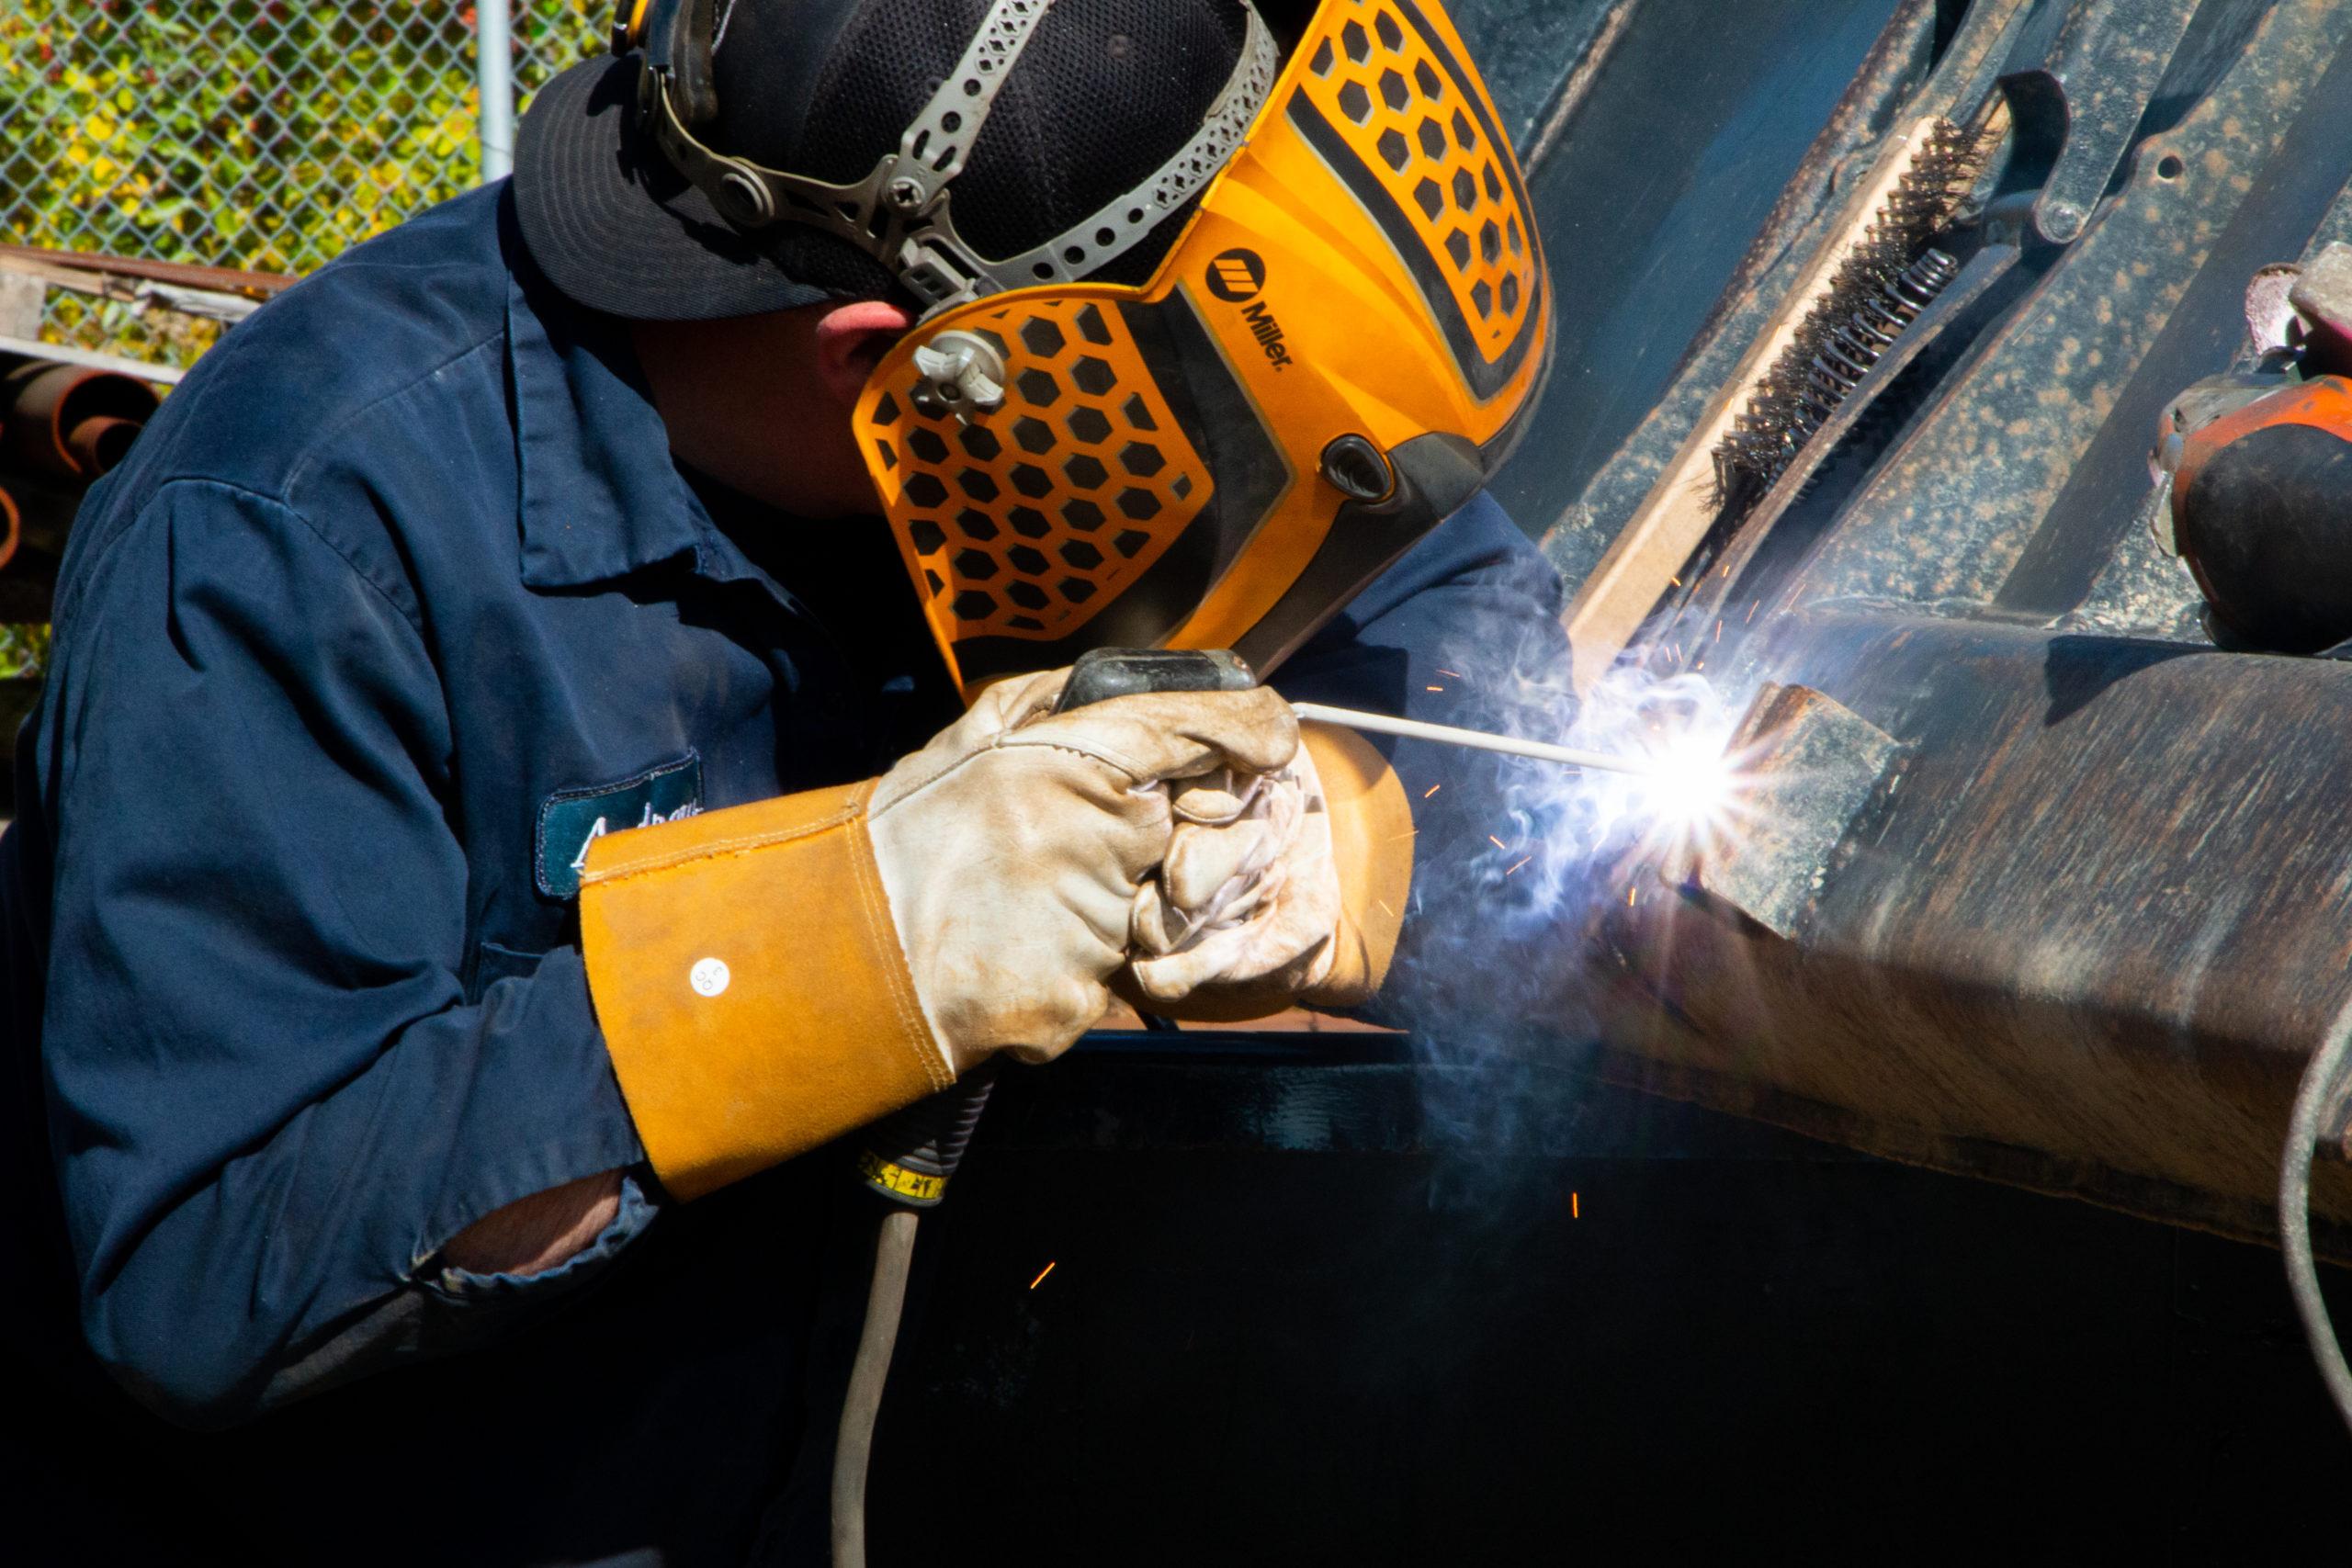 Dump truck welding repair